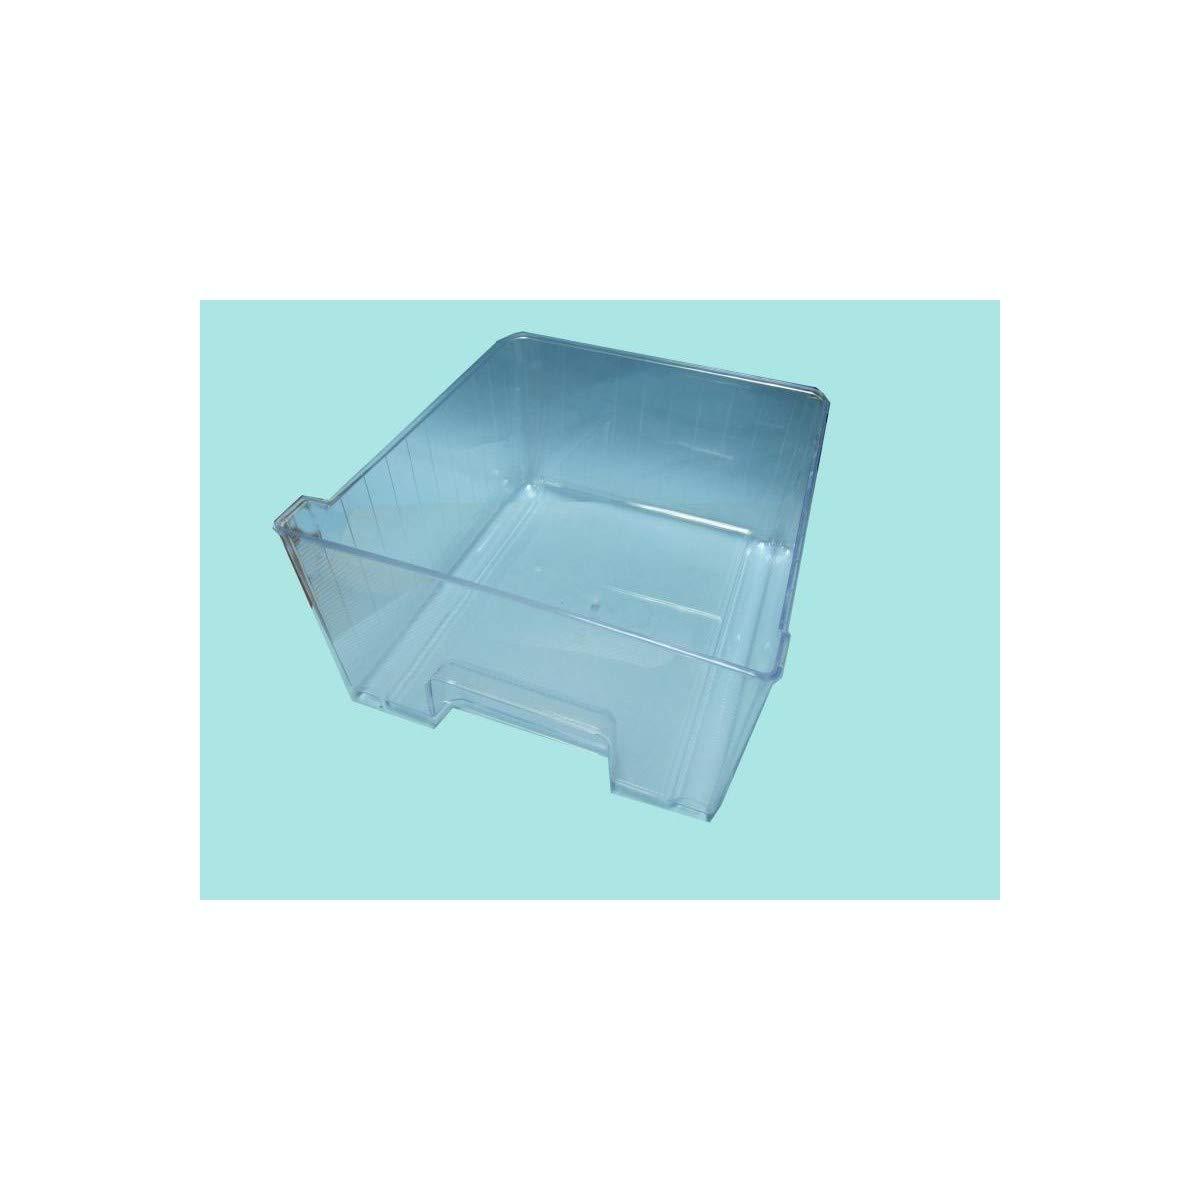 Recamania Cajon verdura frigorifico Compatible con Siemens 355036 ...